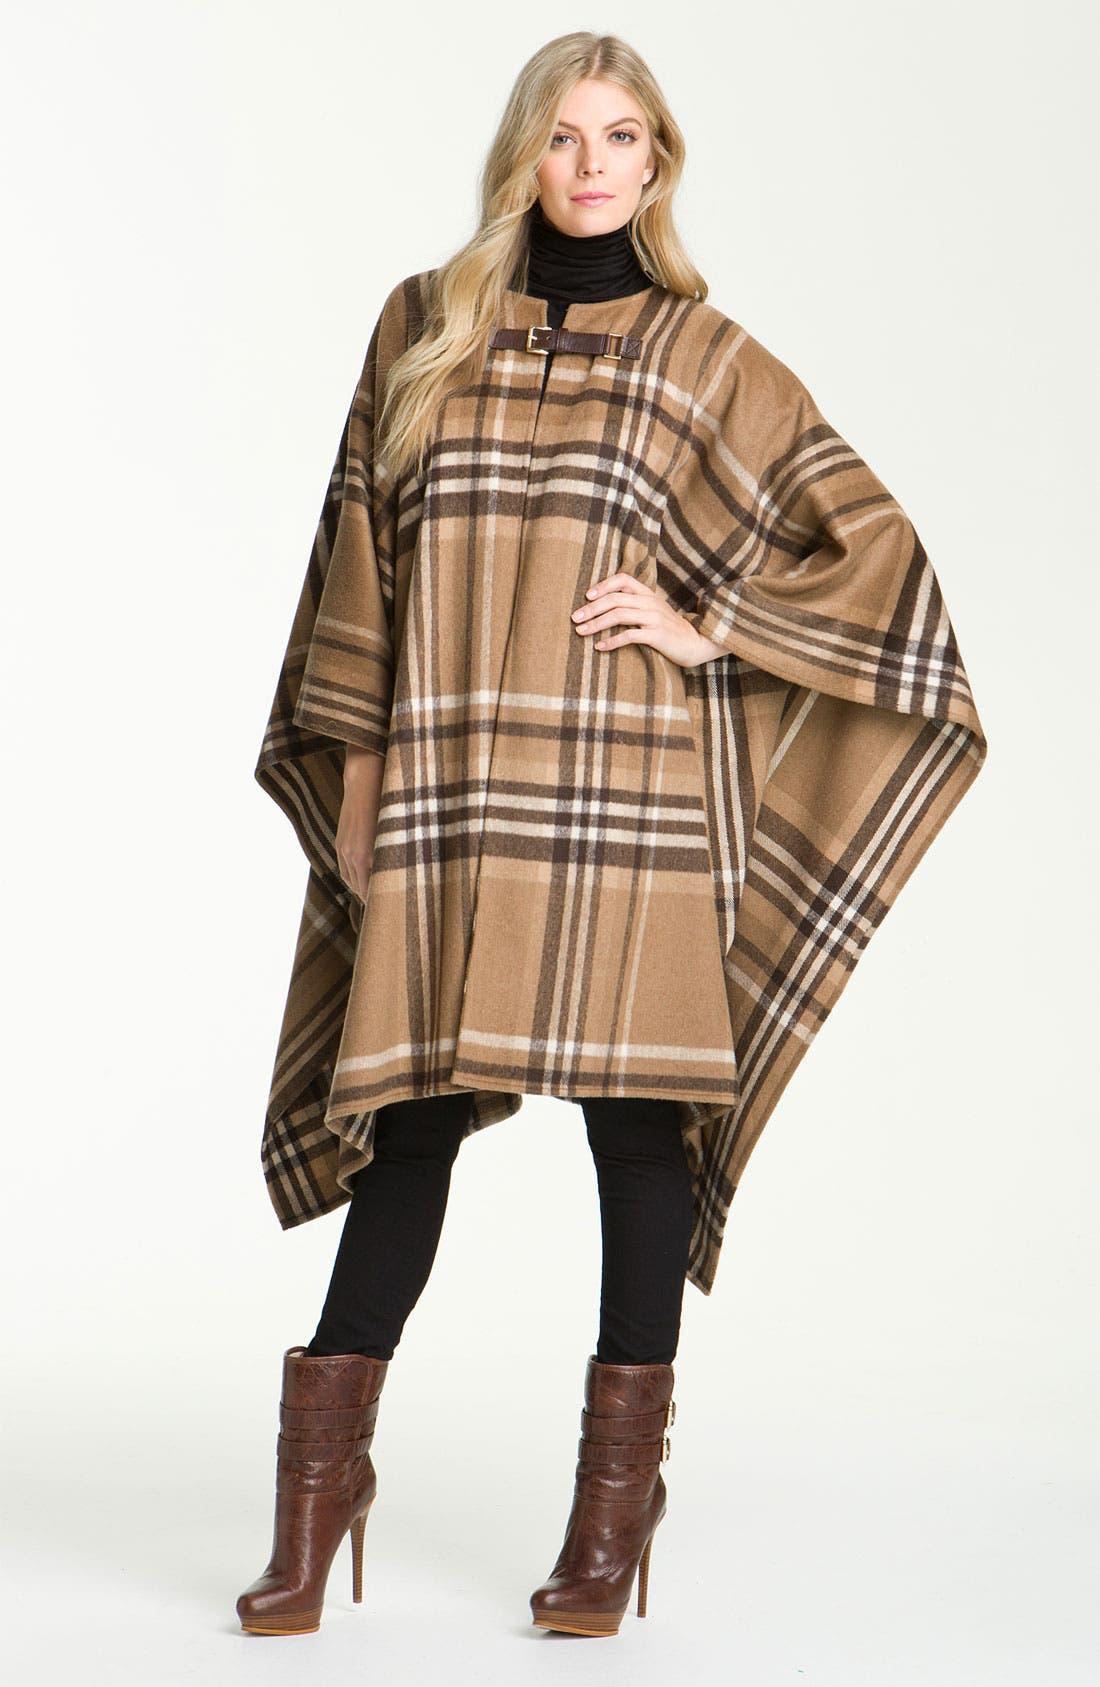 Alternate Image 1 Selected - MICHAEL Michael Kors Buckled Blanket Coat